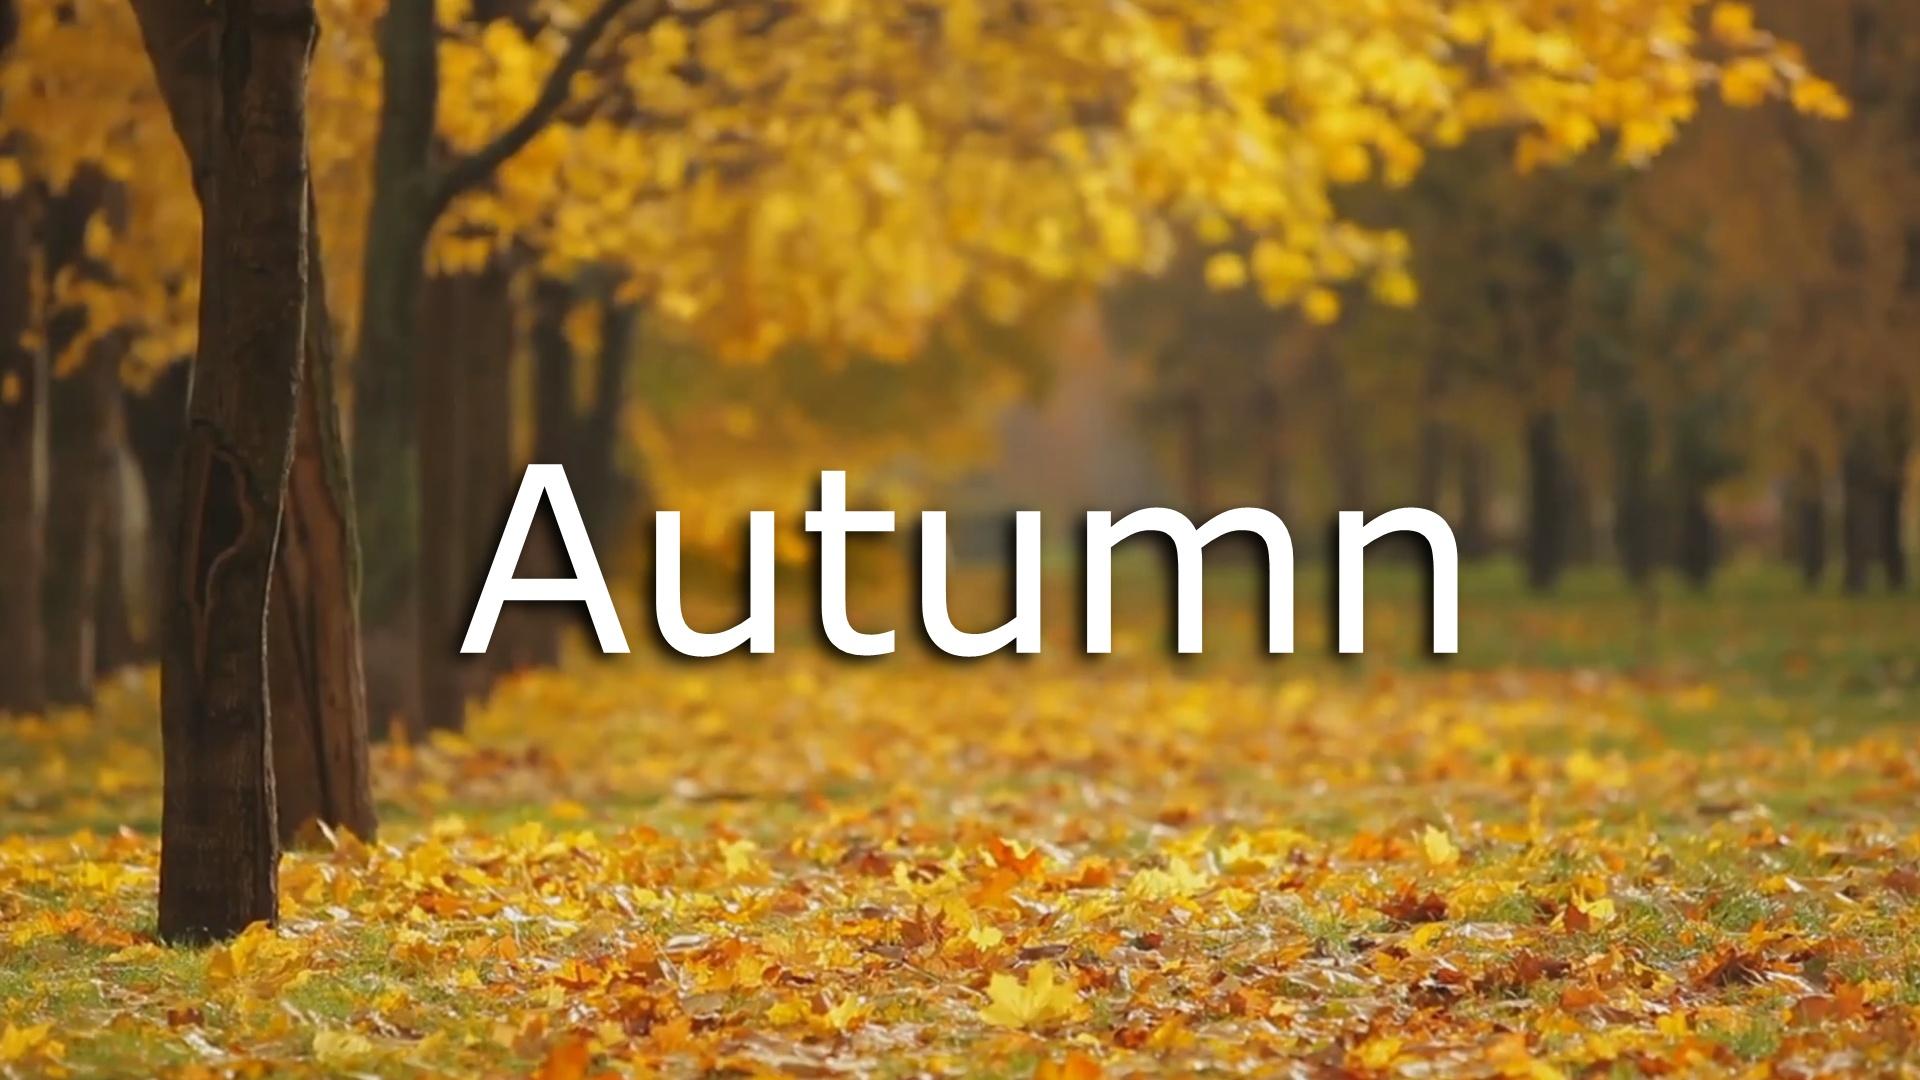 Autumn Nature Short Video